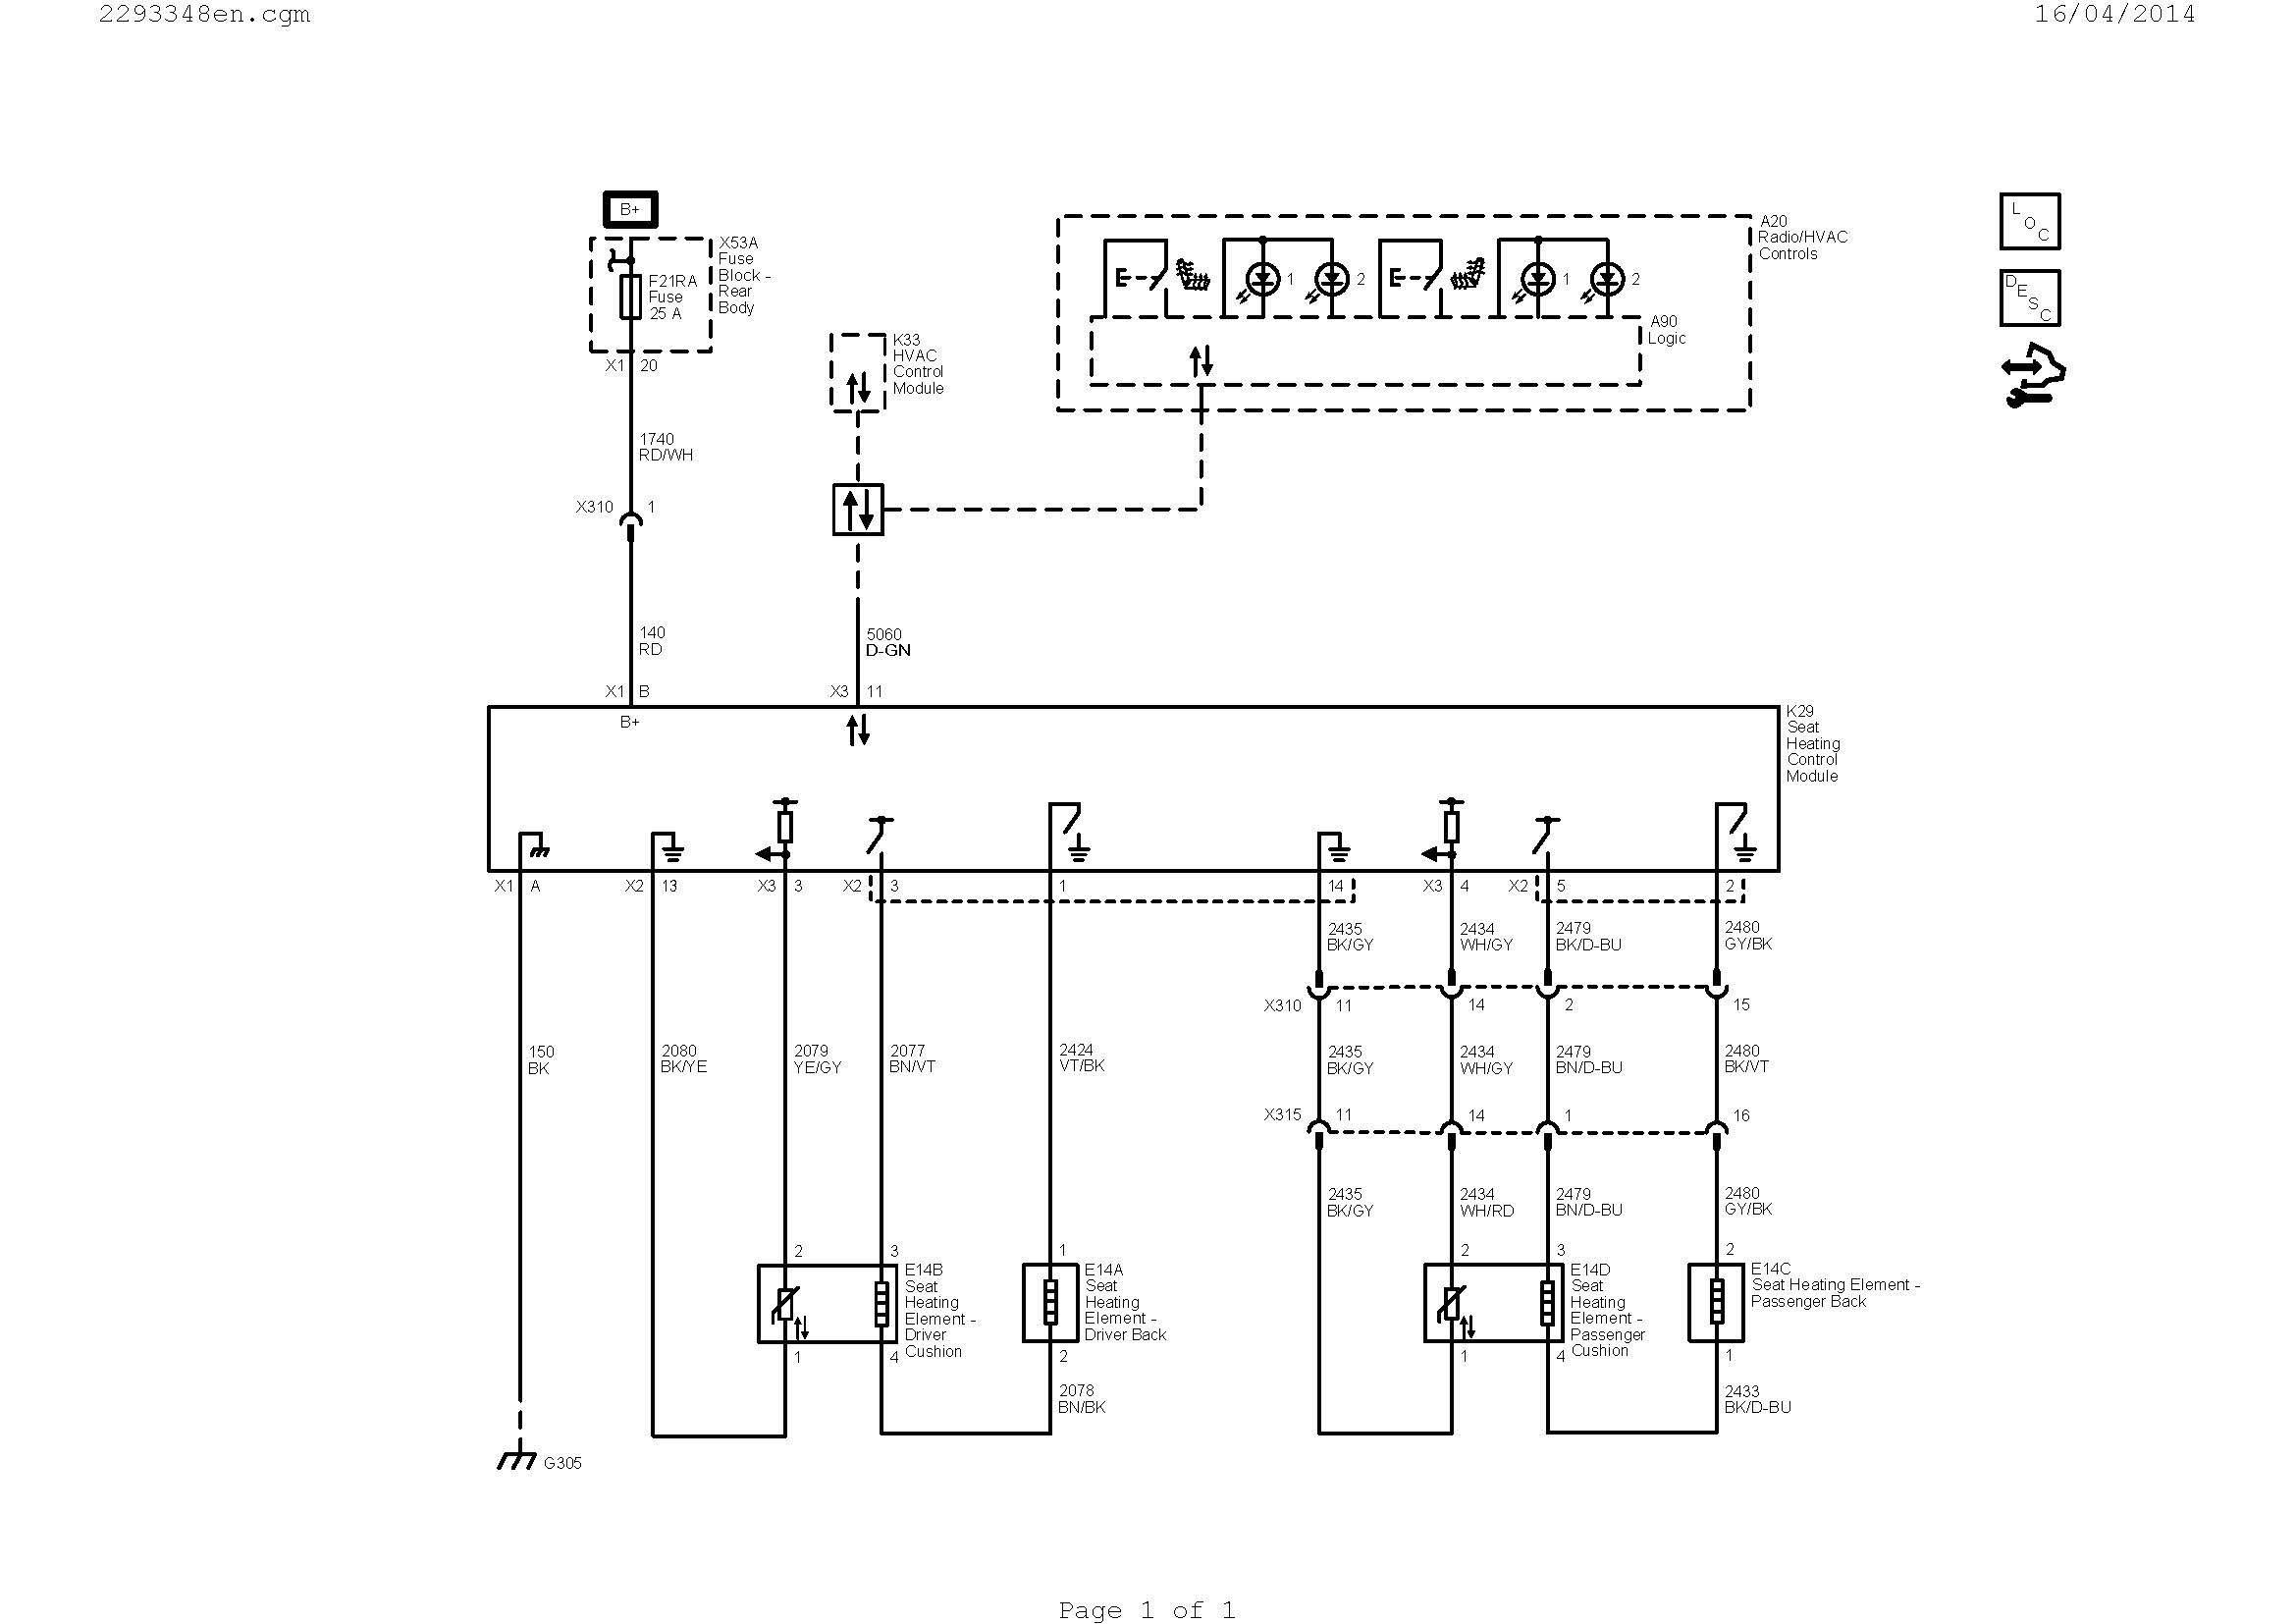 Wiring Diagrams for Free Save Wiring Diagram Guitar Fresh Hvac Diagram Best Hvac Diagram 0d